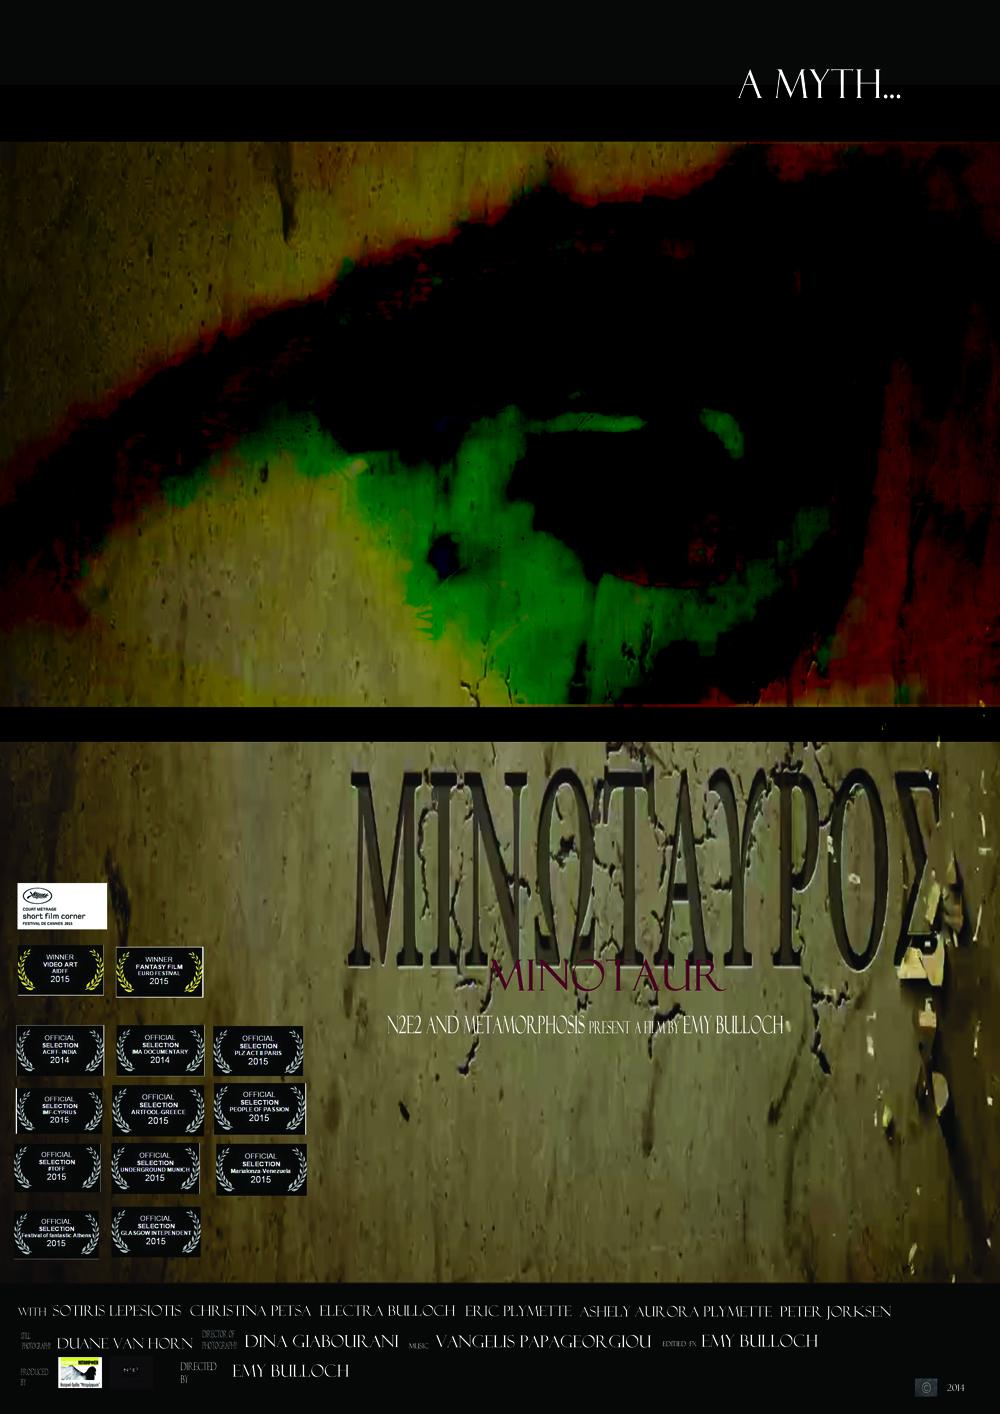 poster minotaur NEW VERSIONpeque